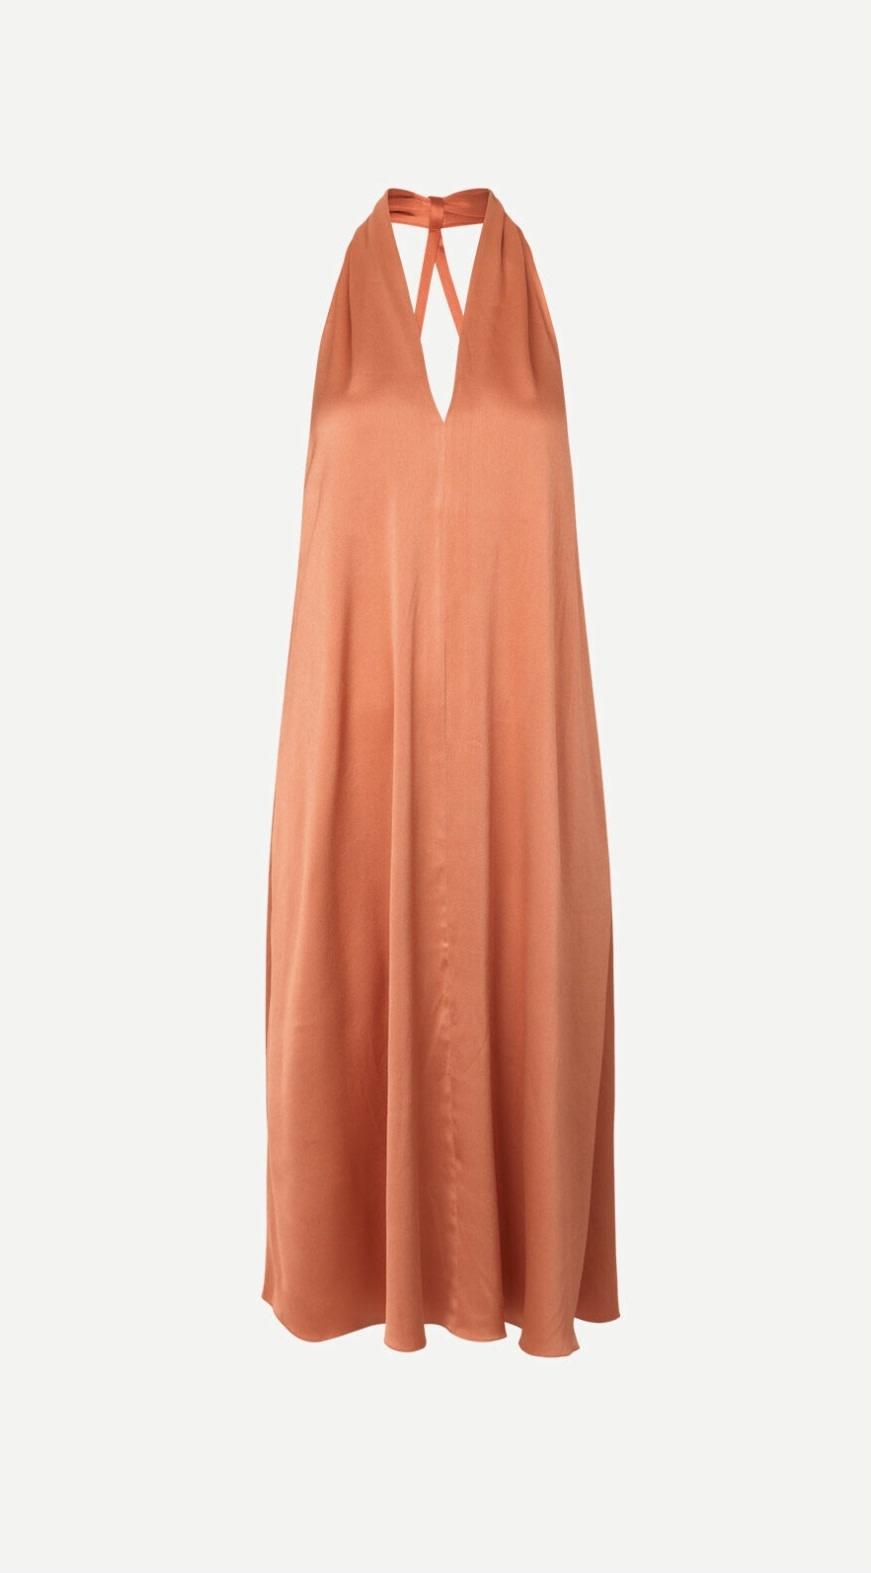 Cille dress Samsoe Samsoe-3